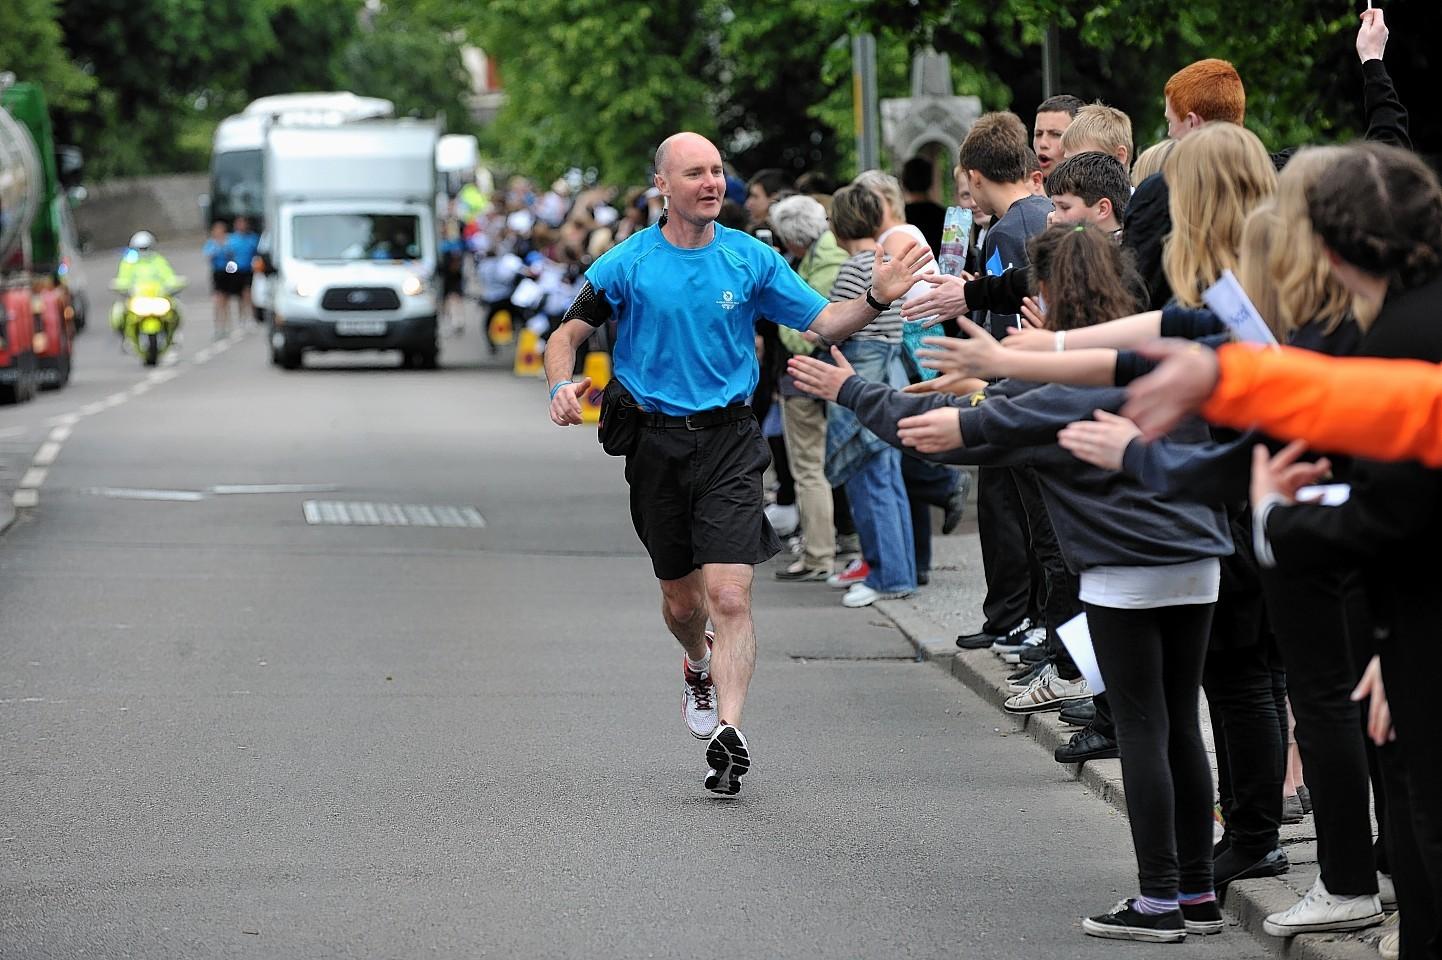 The Baton makes its way through Moray